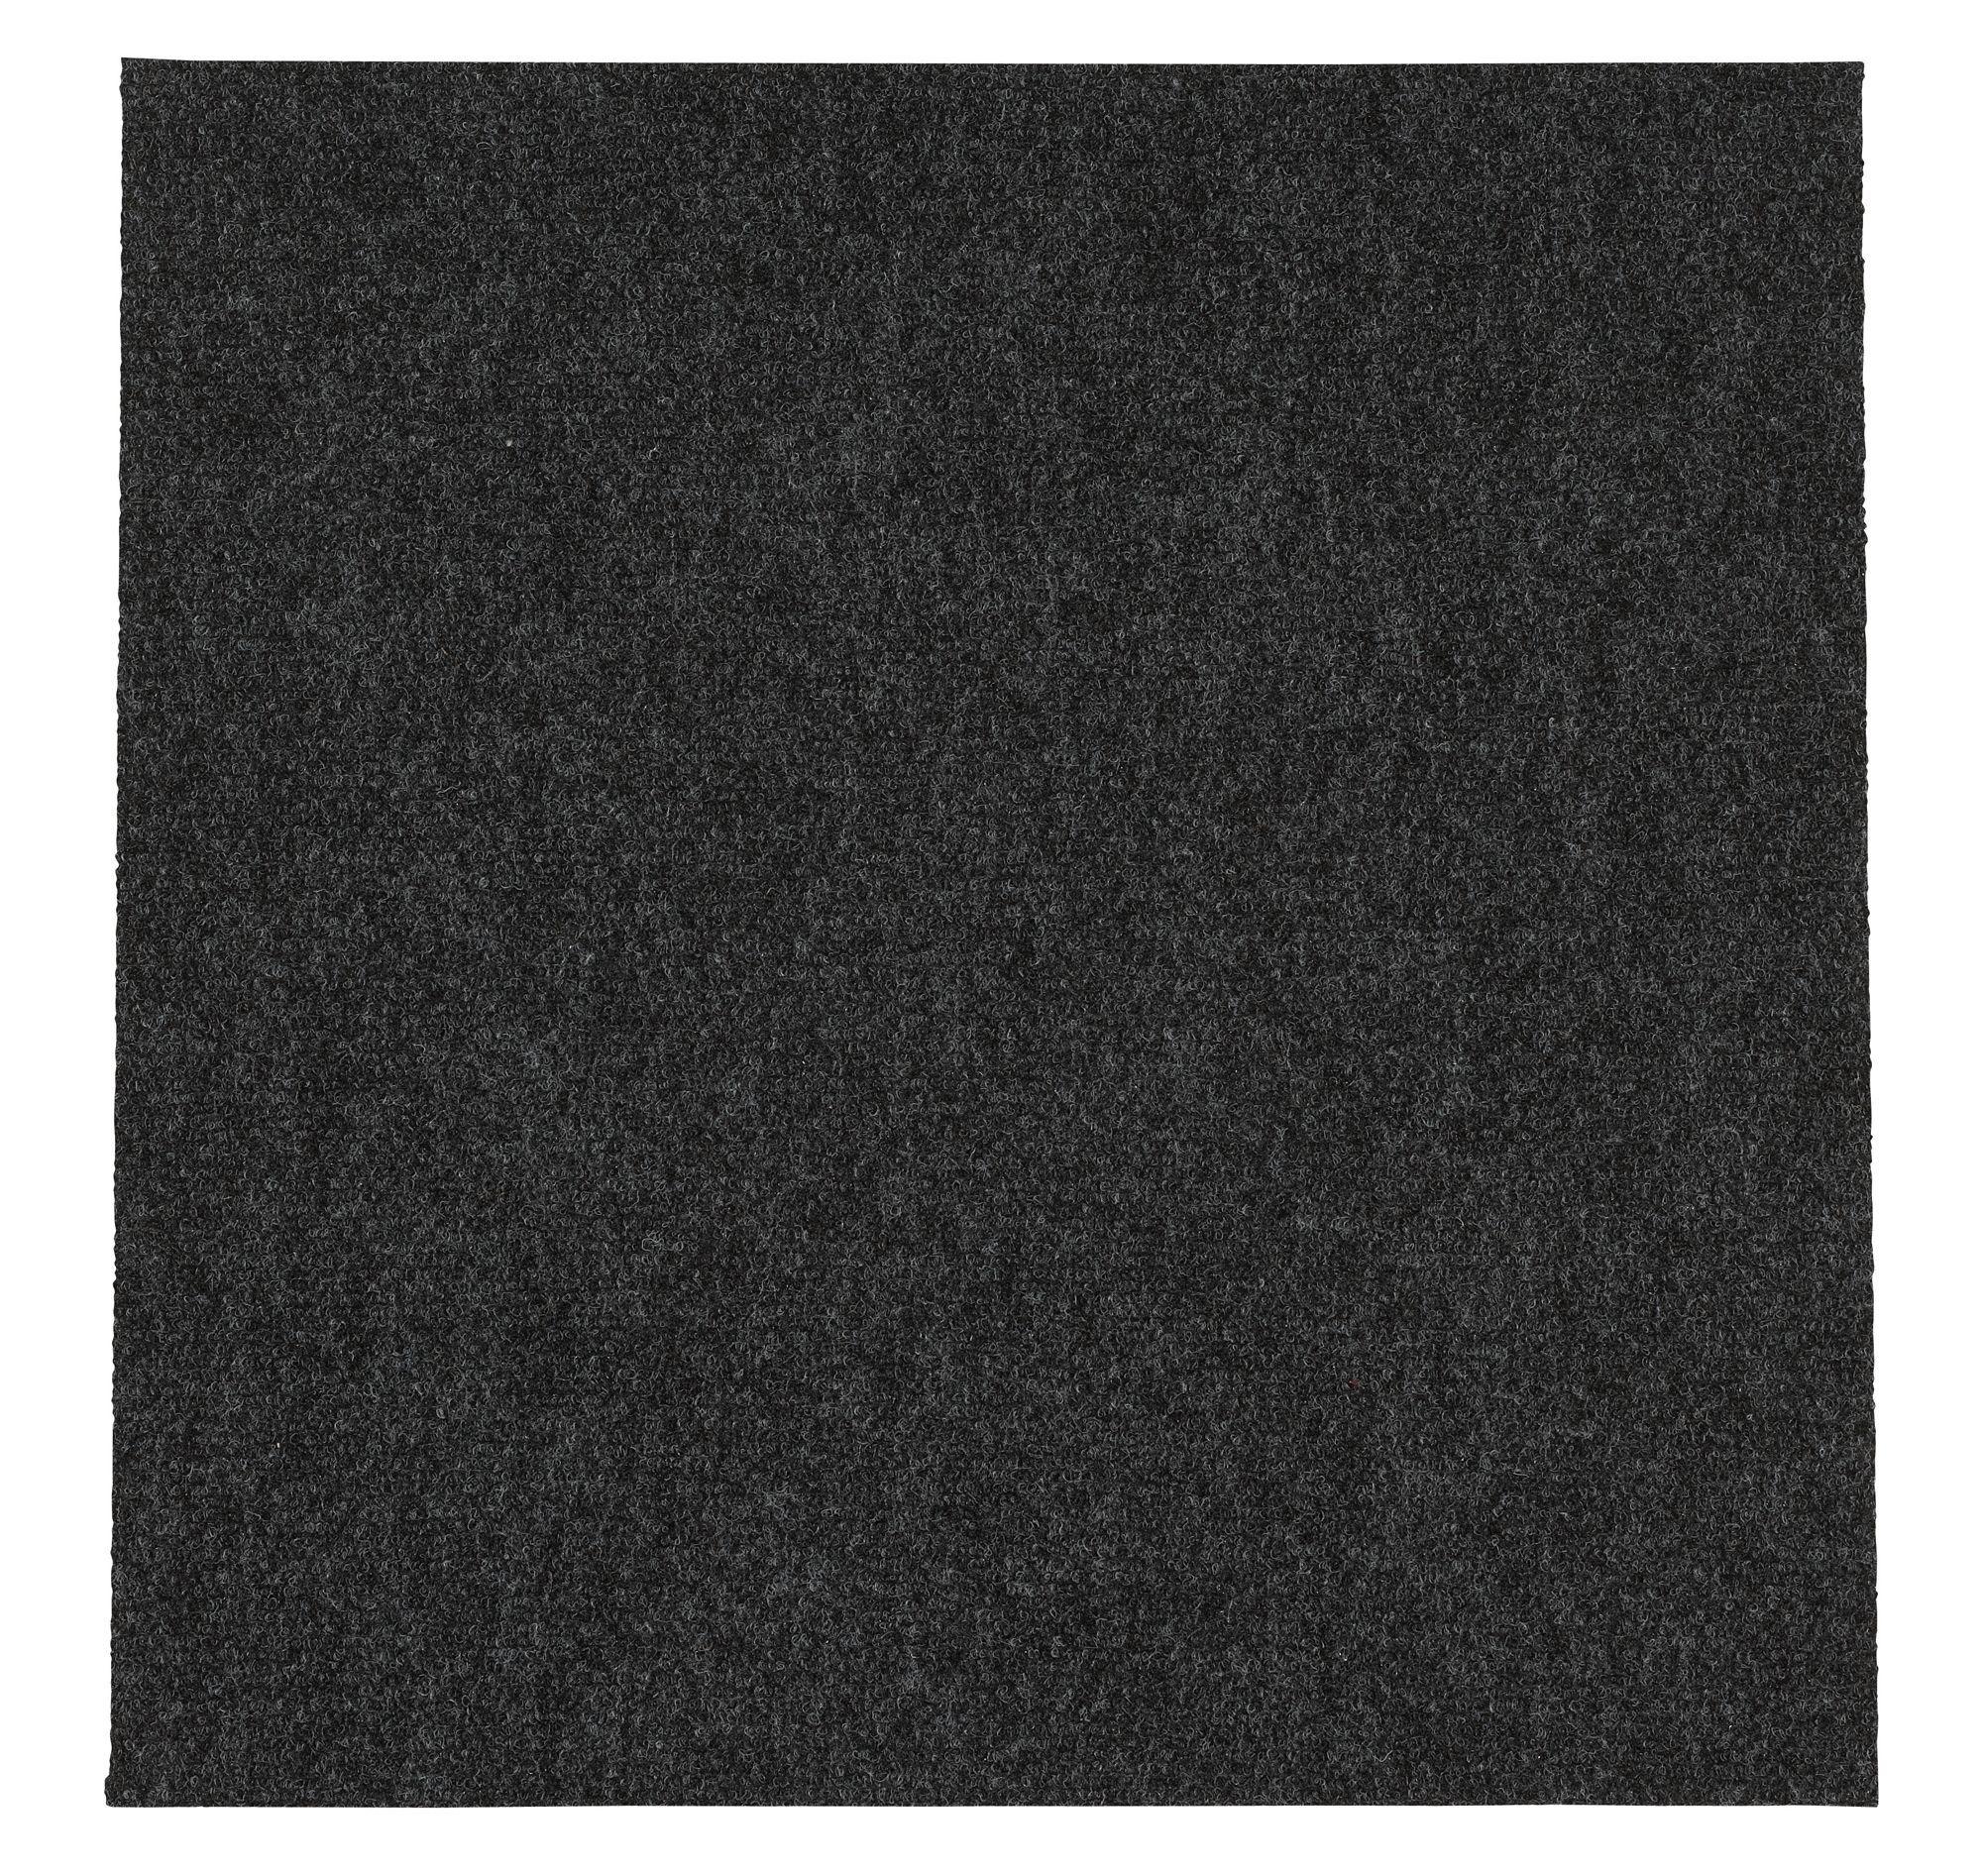 B Q Grey Carpet Tile Pack Of 10